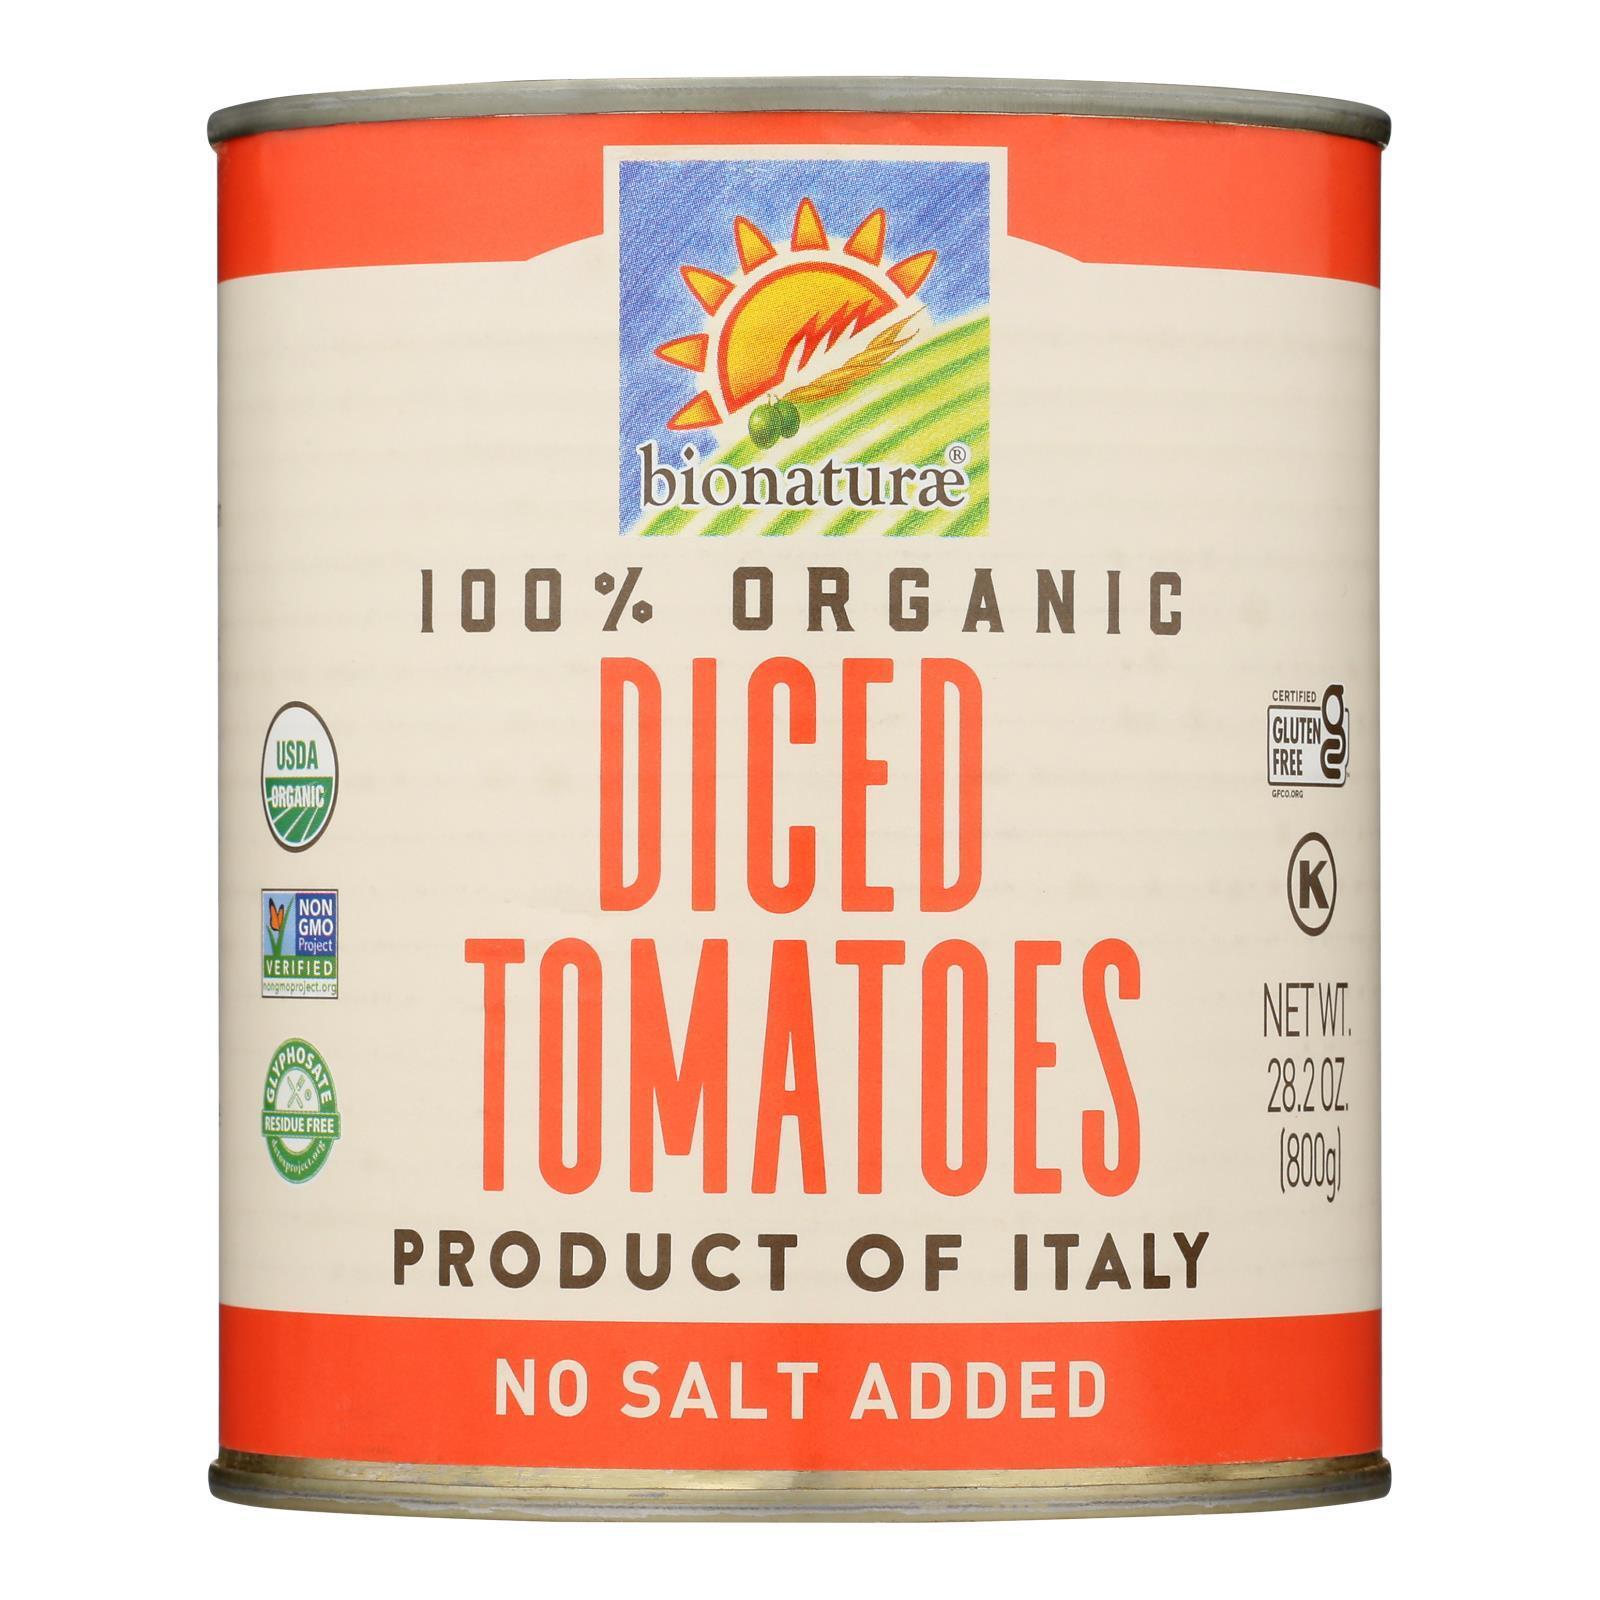 Bionaturae Tomatoes - Organic - Diced - 28.2 oz - case of 12